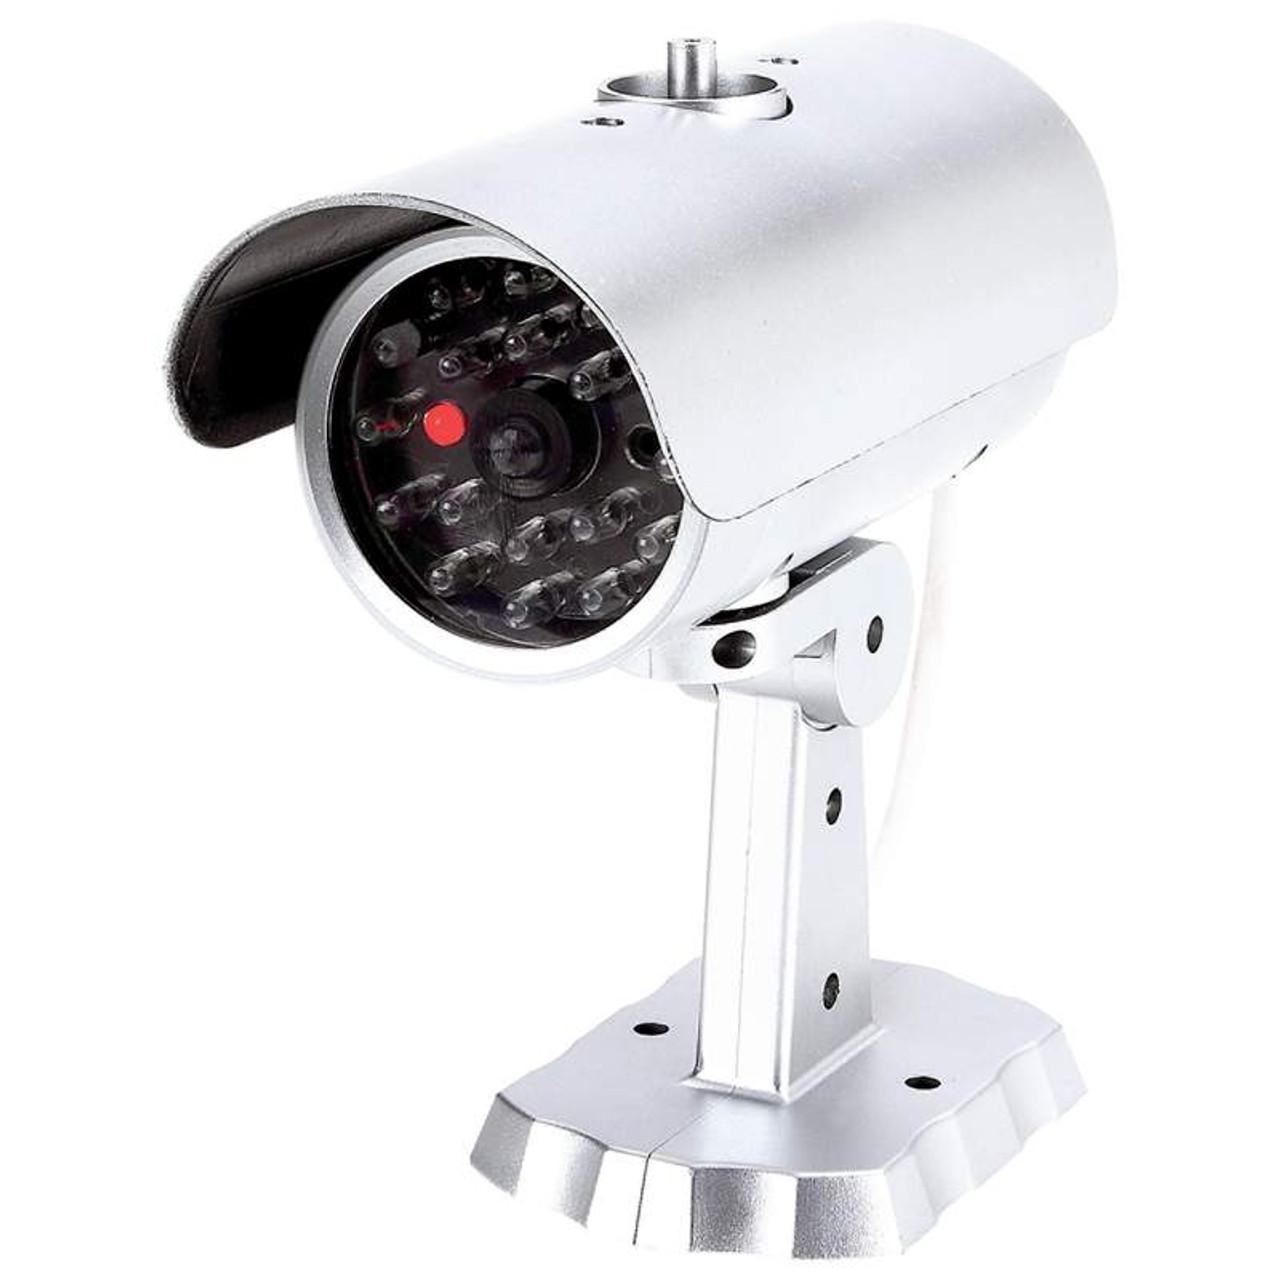 Mitaki-Japan® Non-Functioning Mock Security Camera